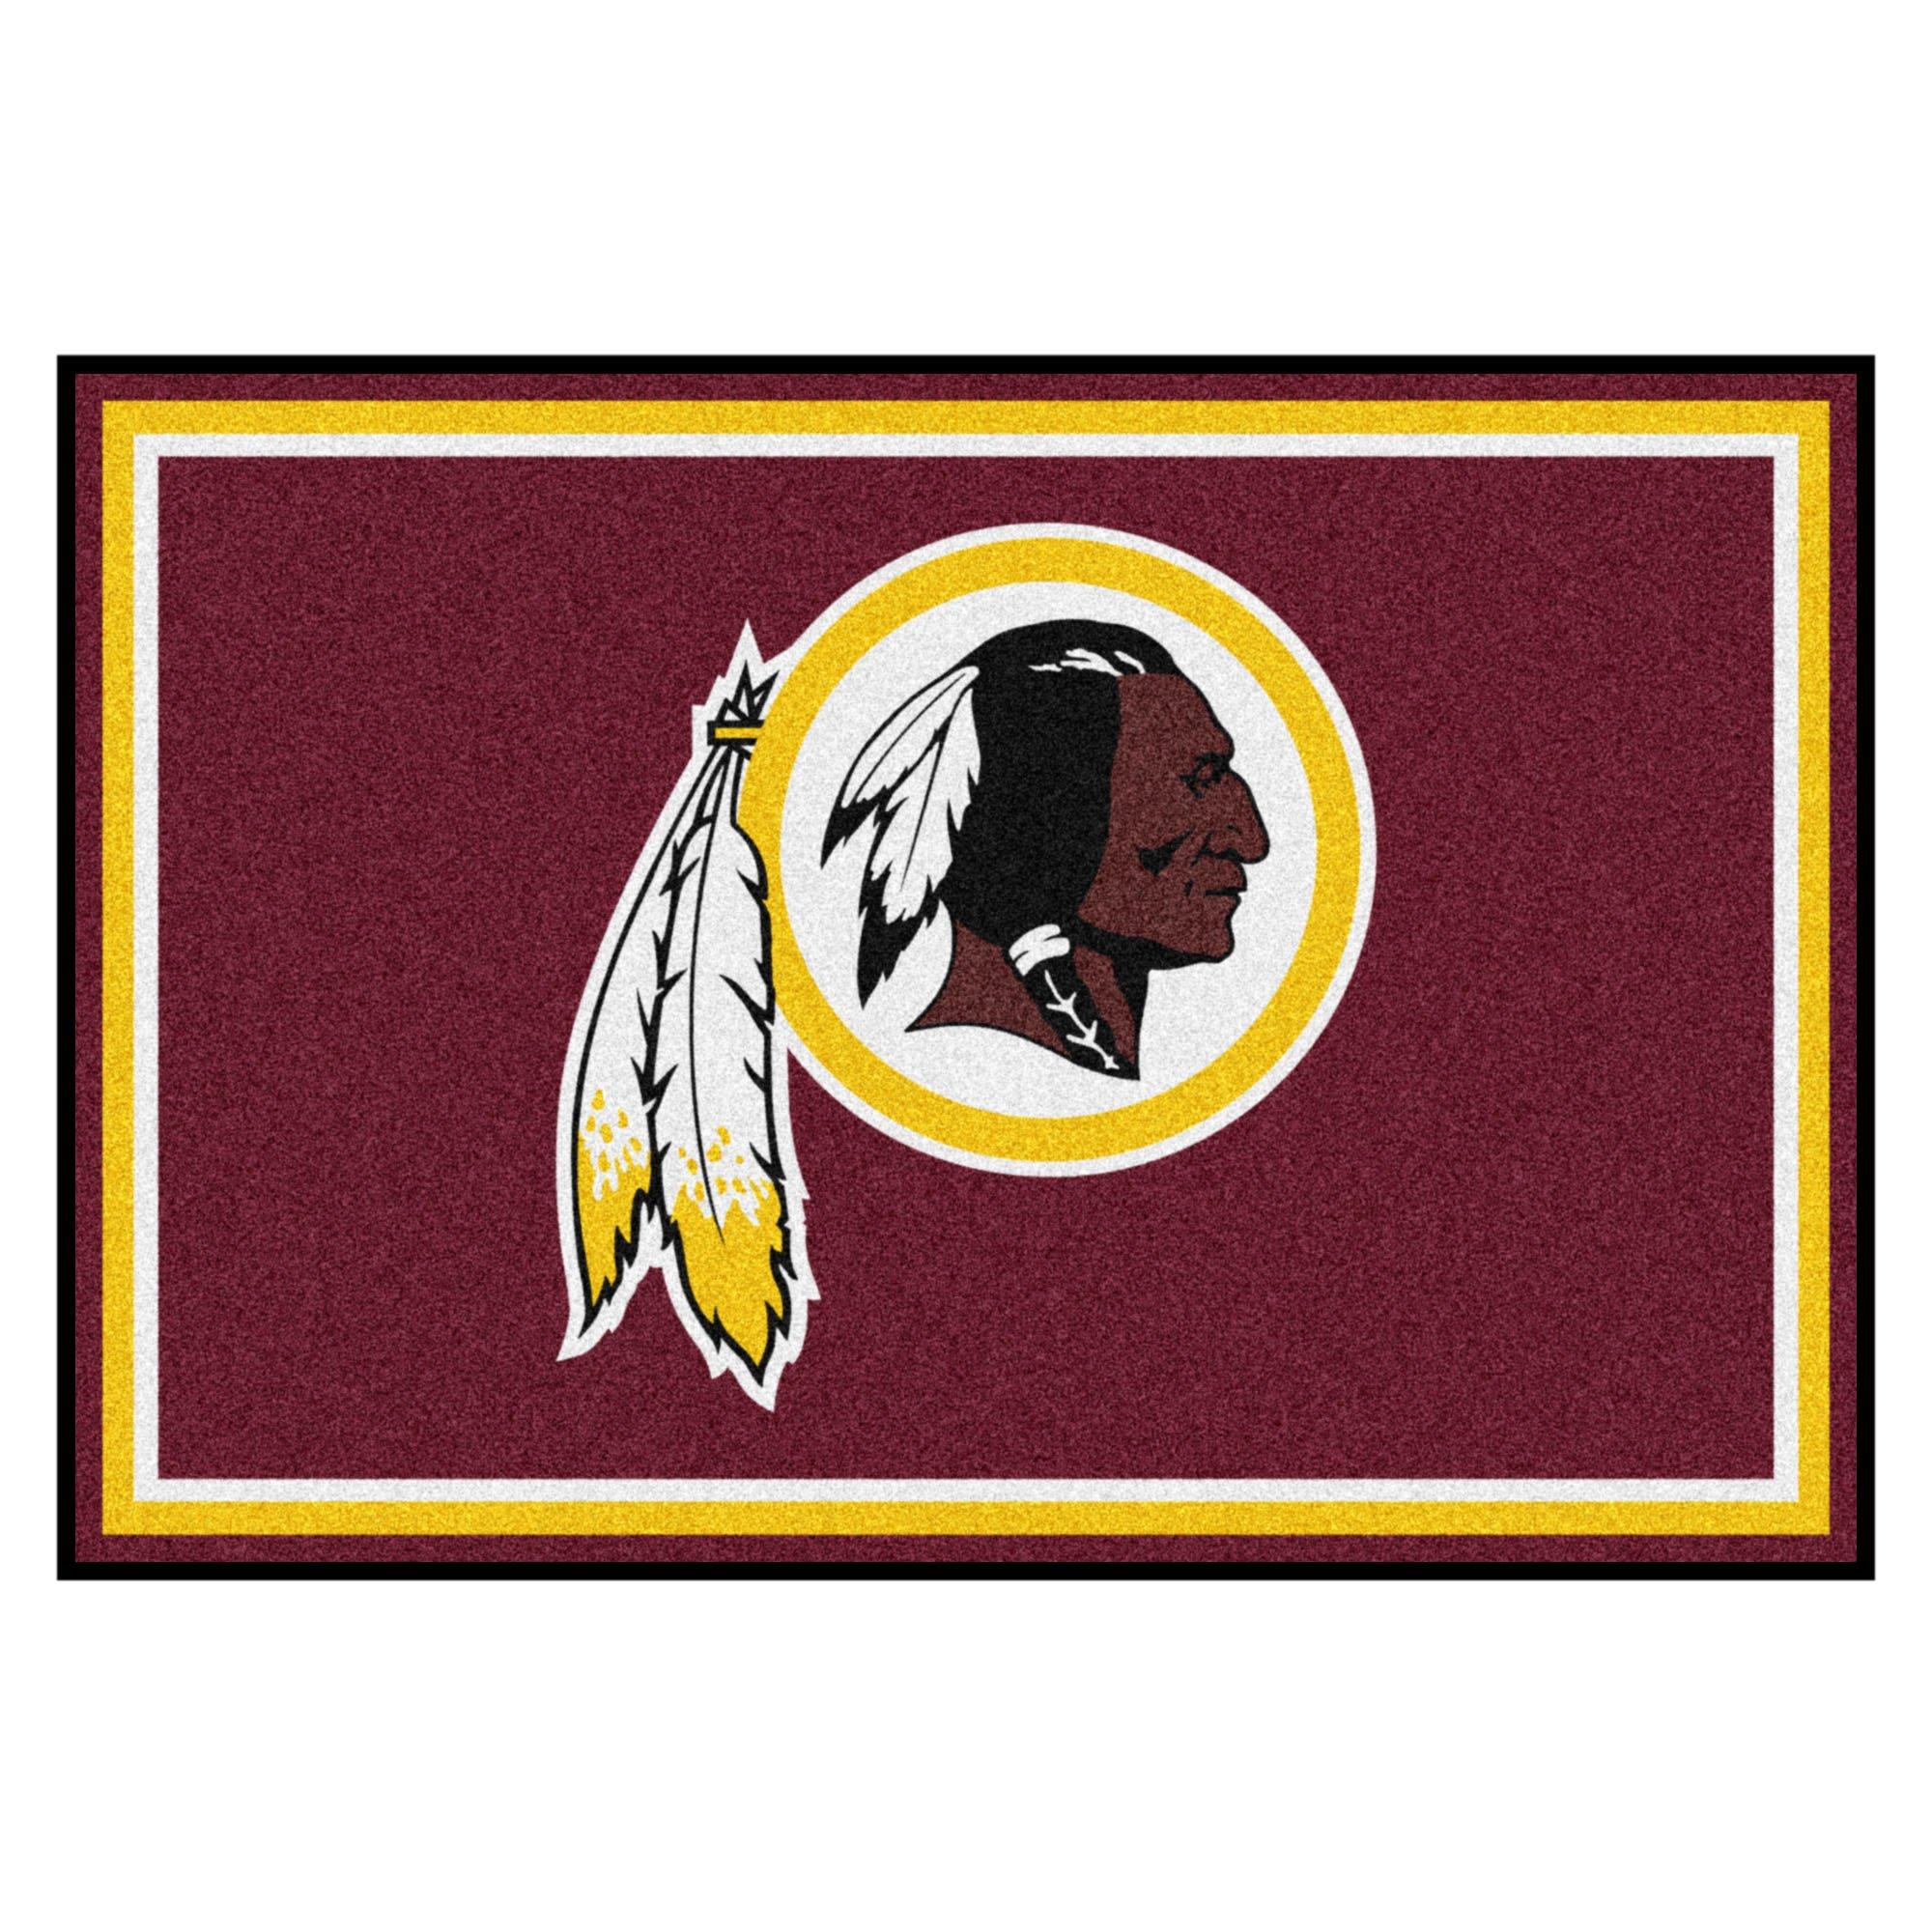 FANMATS NFL Washington Redskins Nylon Face 5X8 Plush Rug by Fanmats